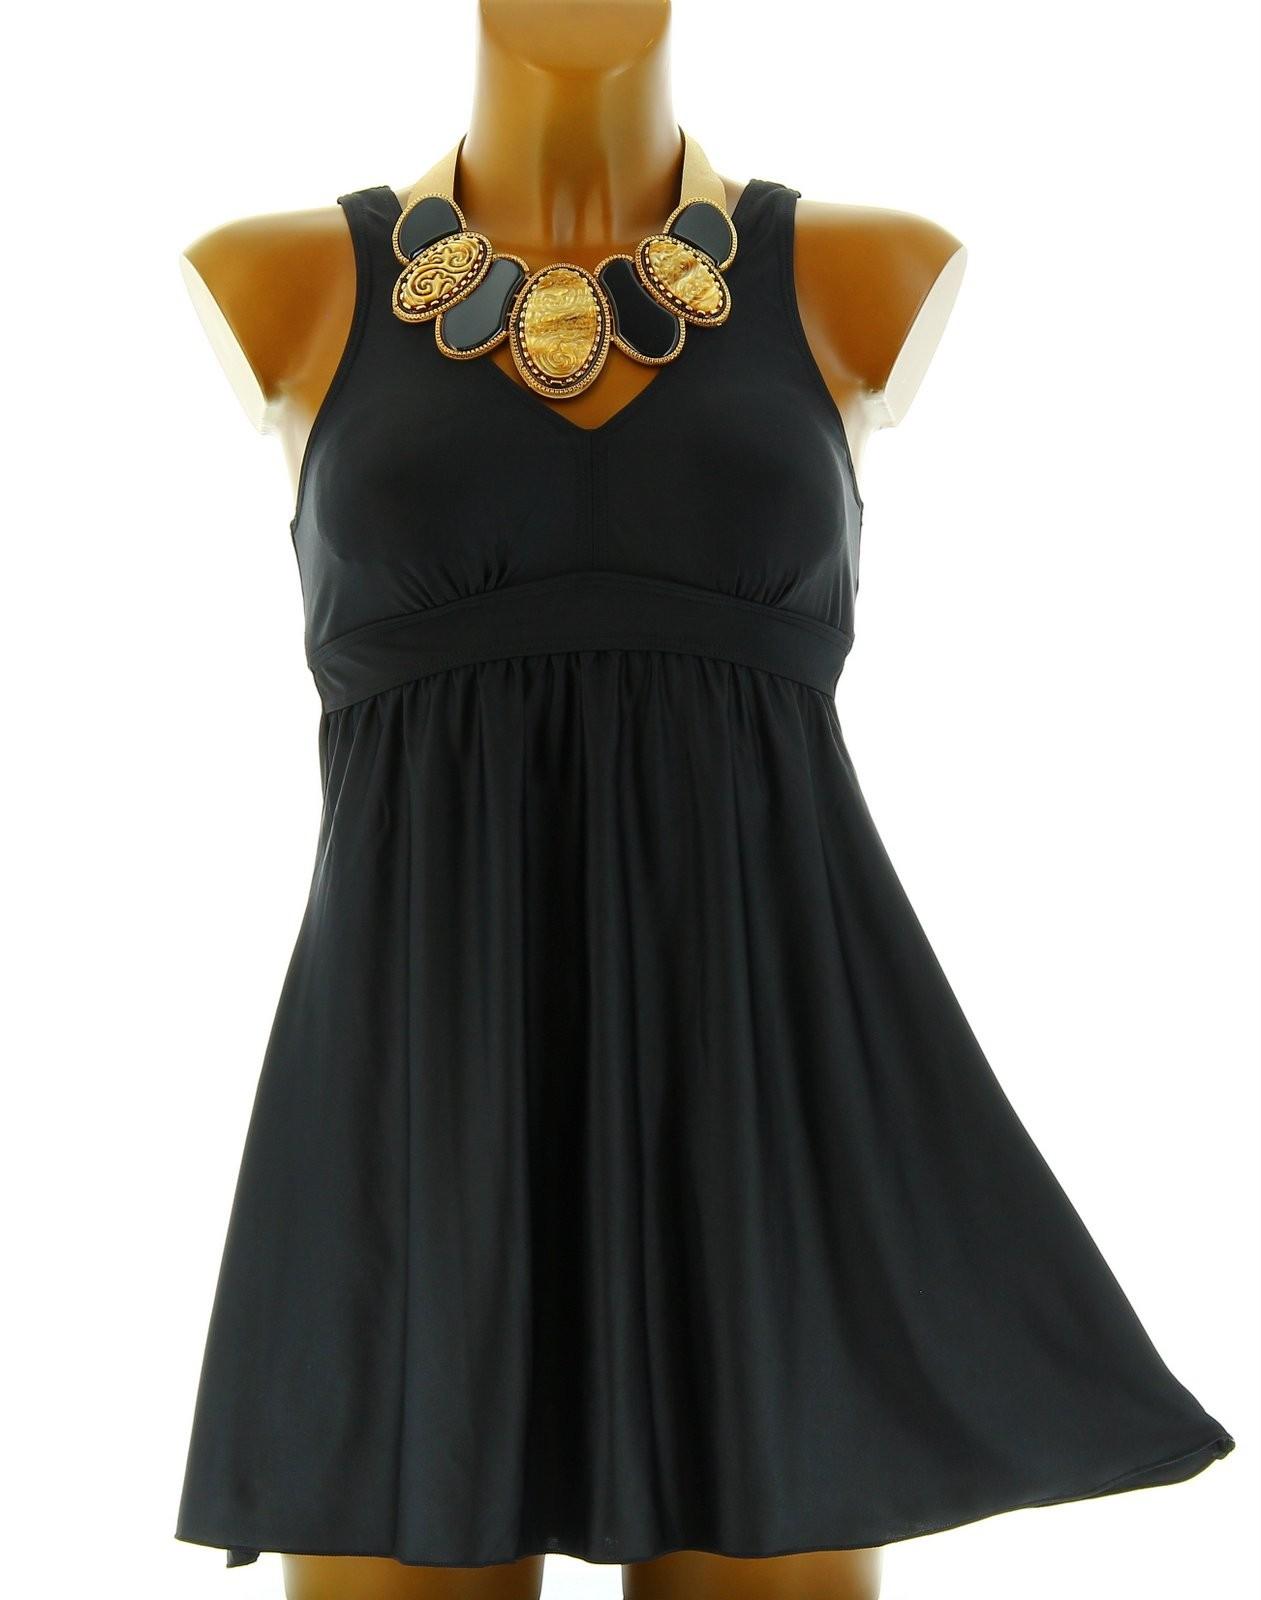 maillot de bain robe grande taille. Black Bedroom Furniture Sets. Home Design Ideas